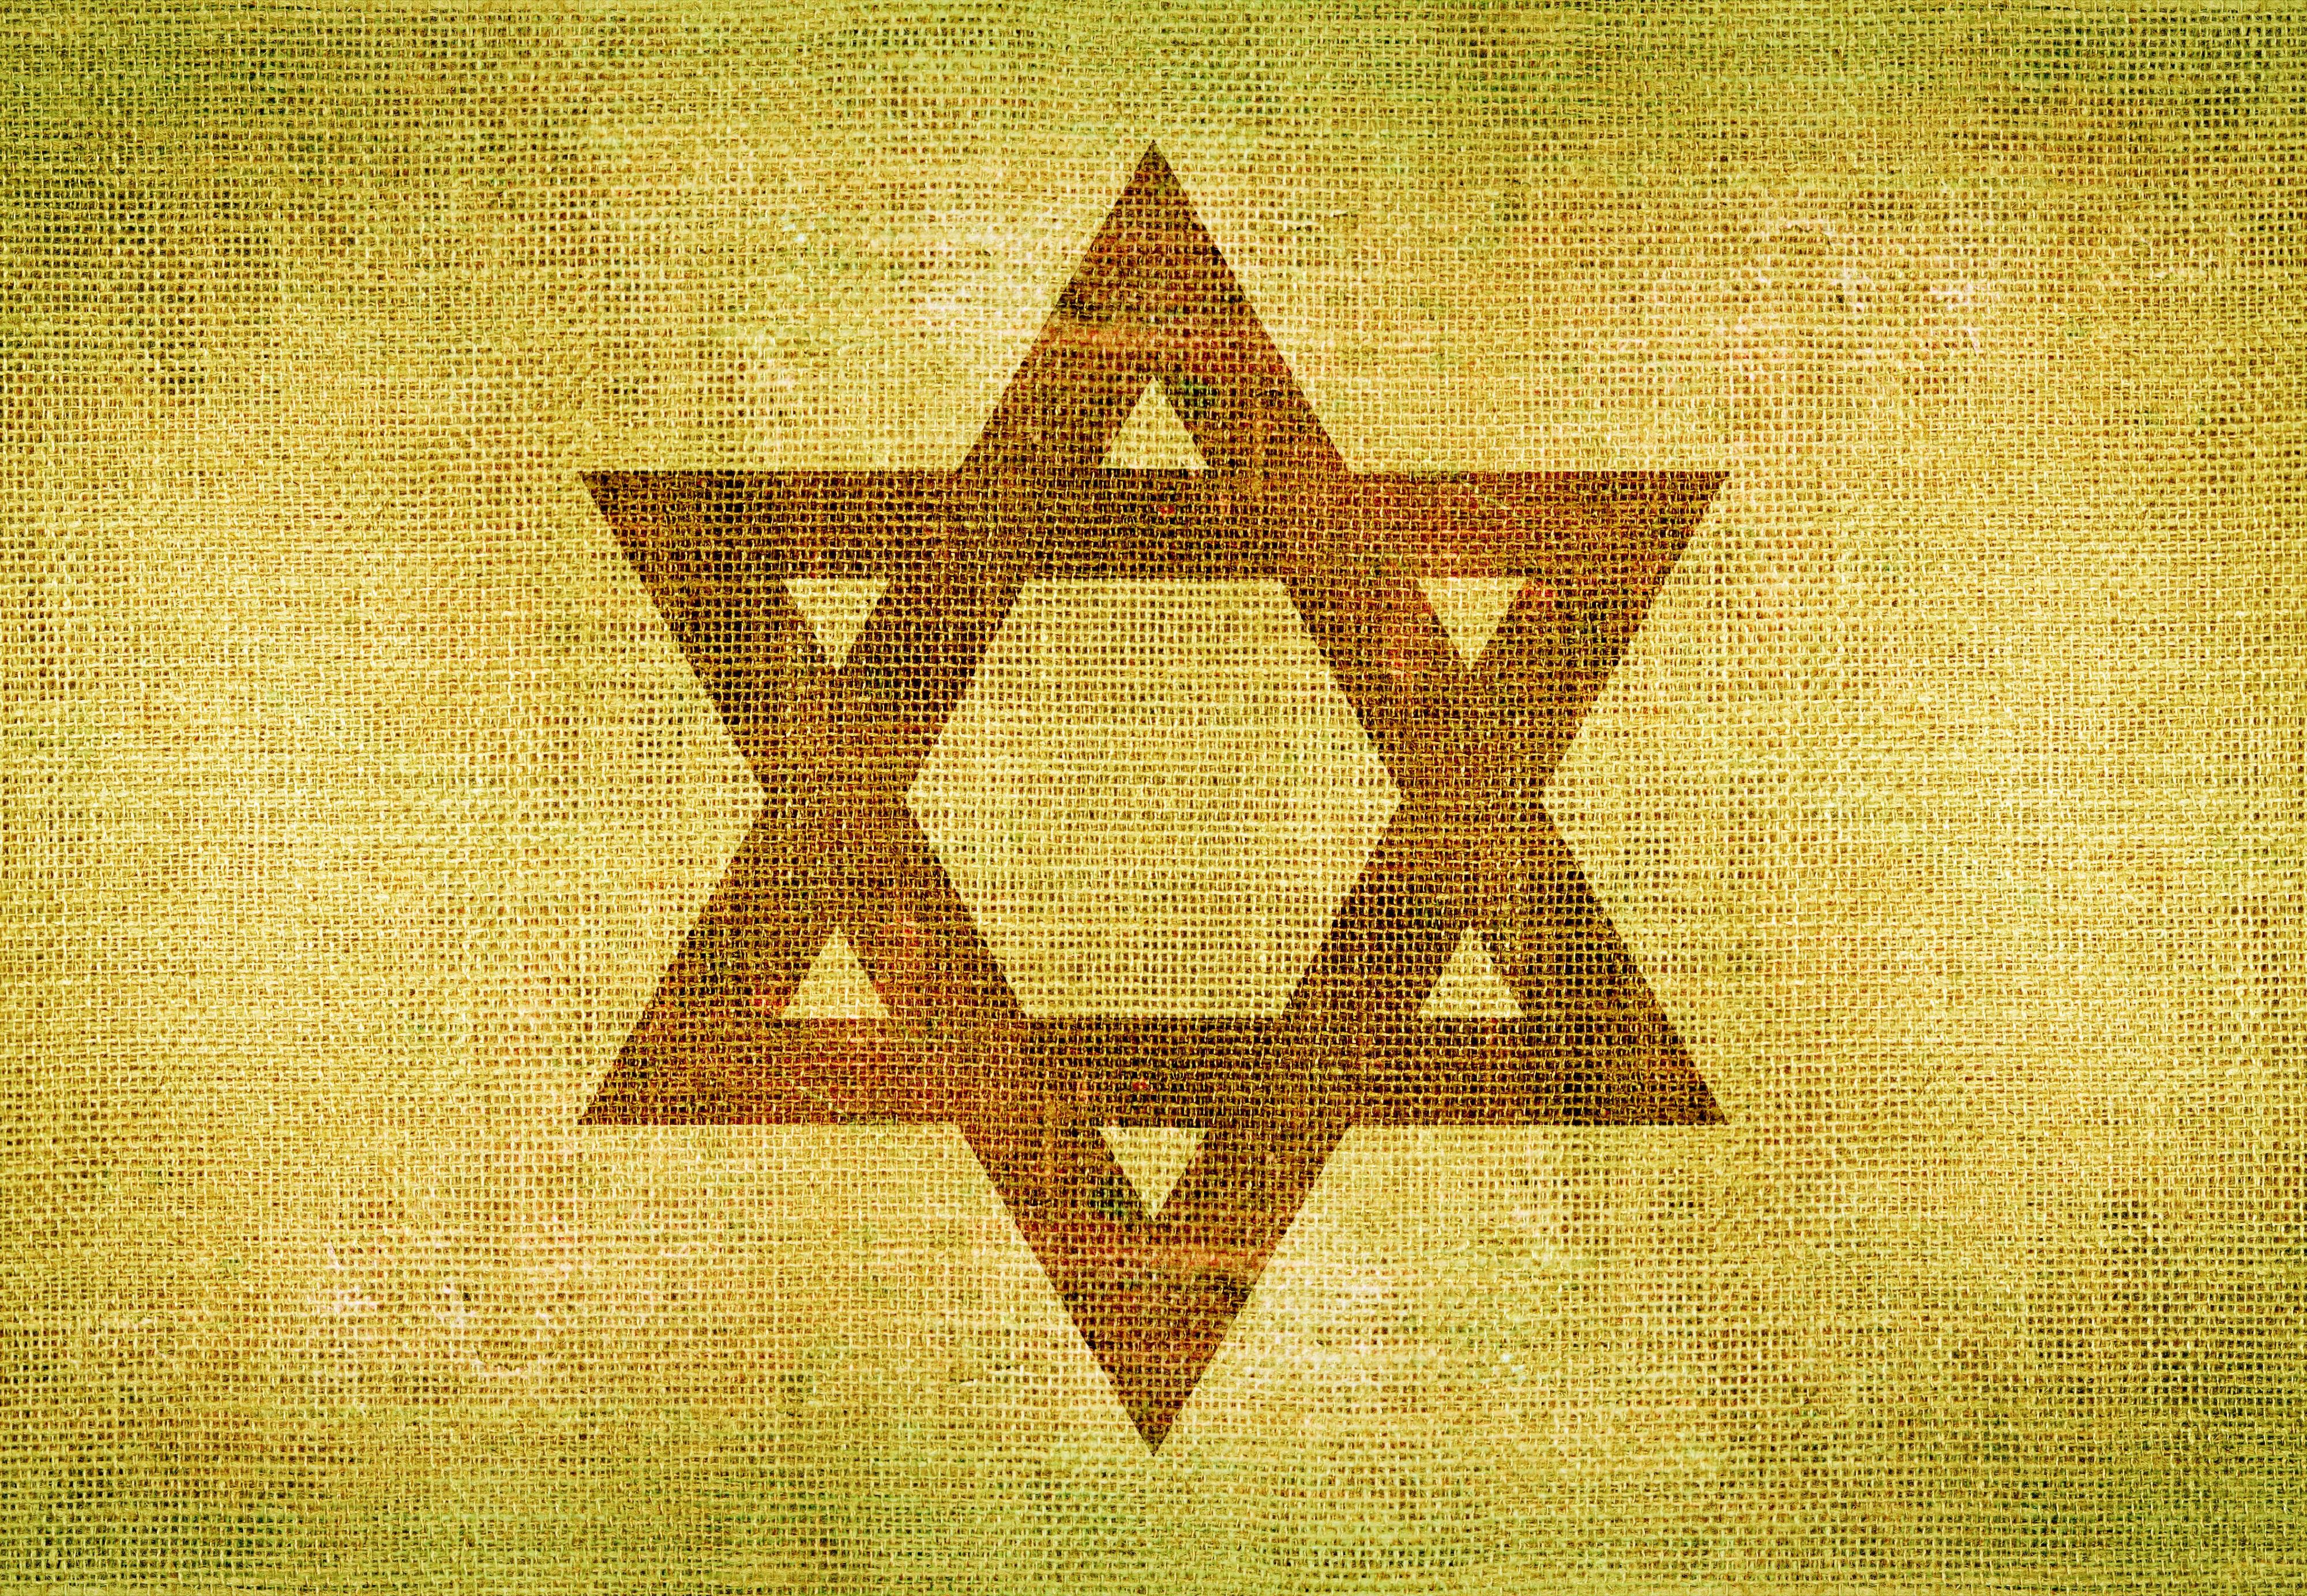 Star of David on Canvas. Jewish Symbol Background Illustration.